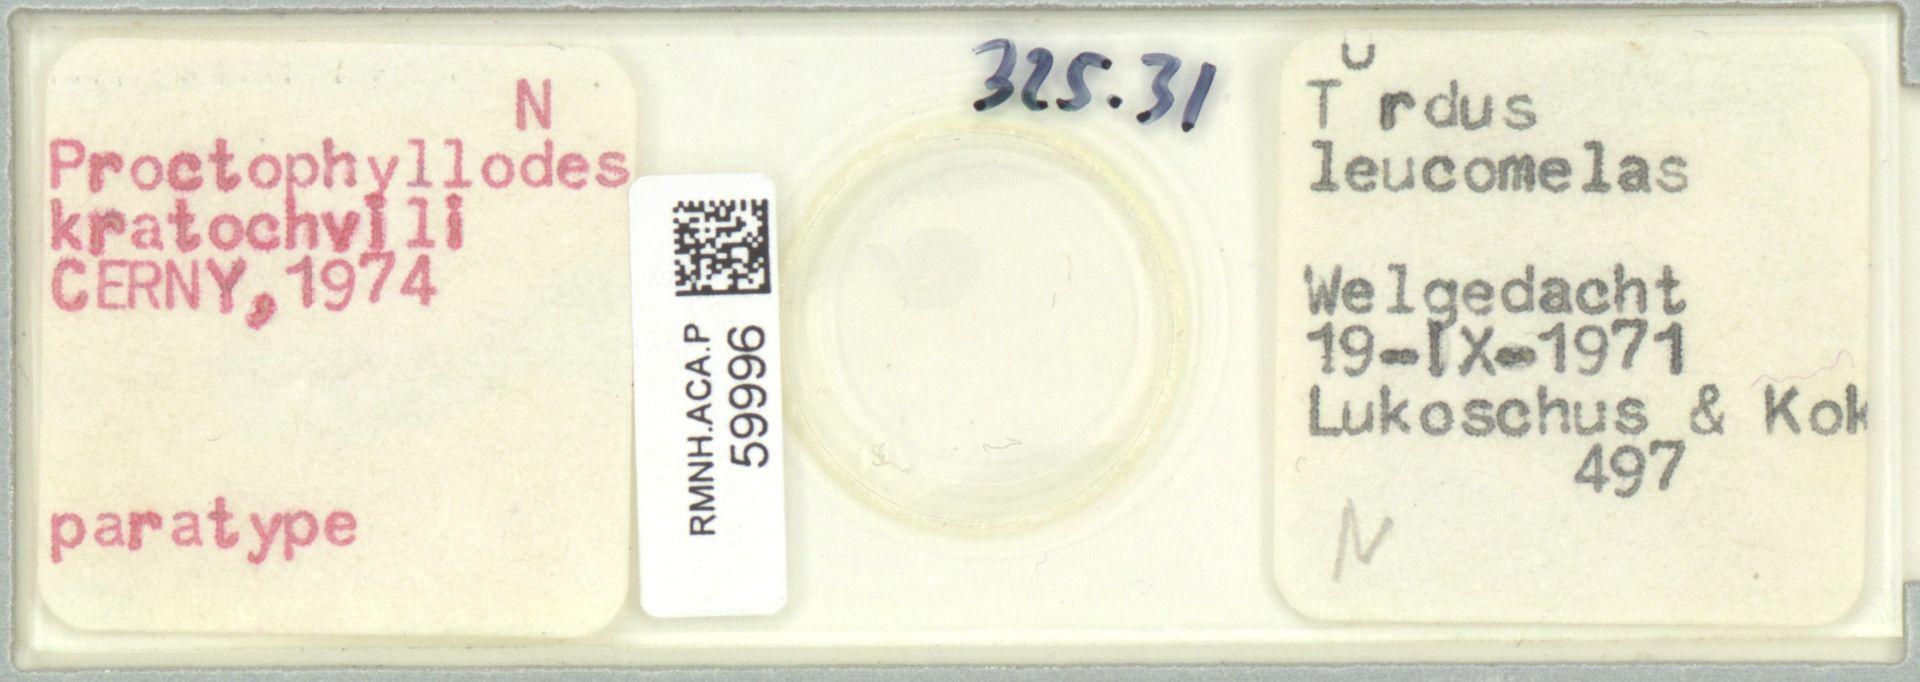 RMNH.ACA.P.59996 | Proctophyllodes kratochvili Cerny, 1974